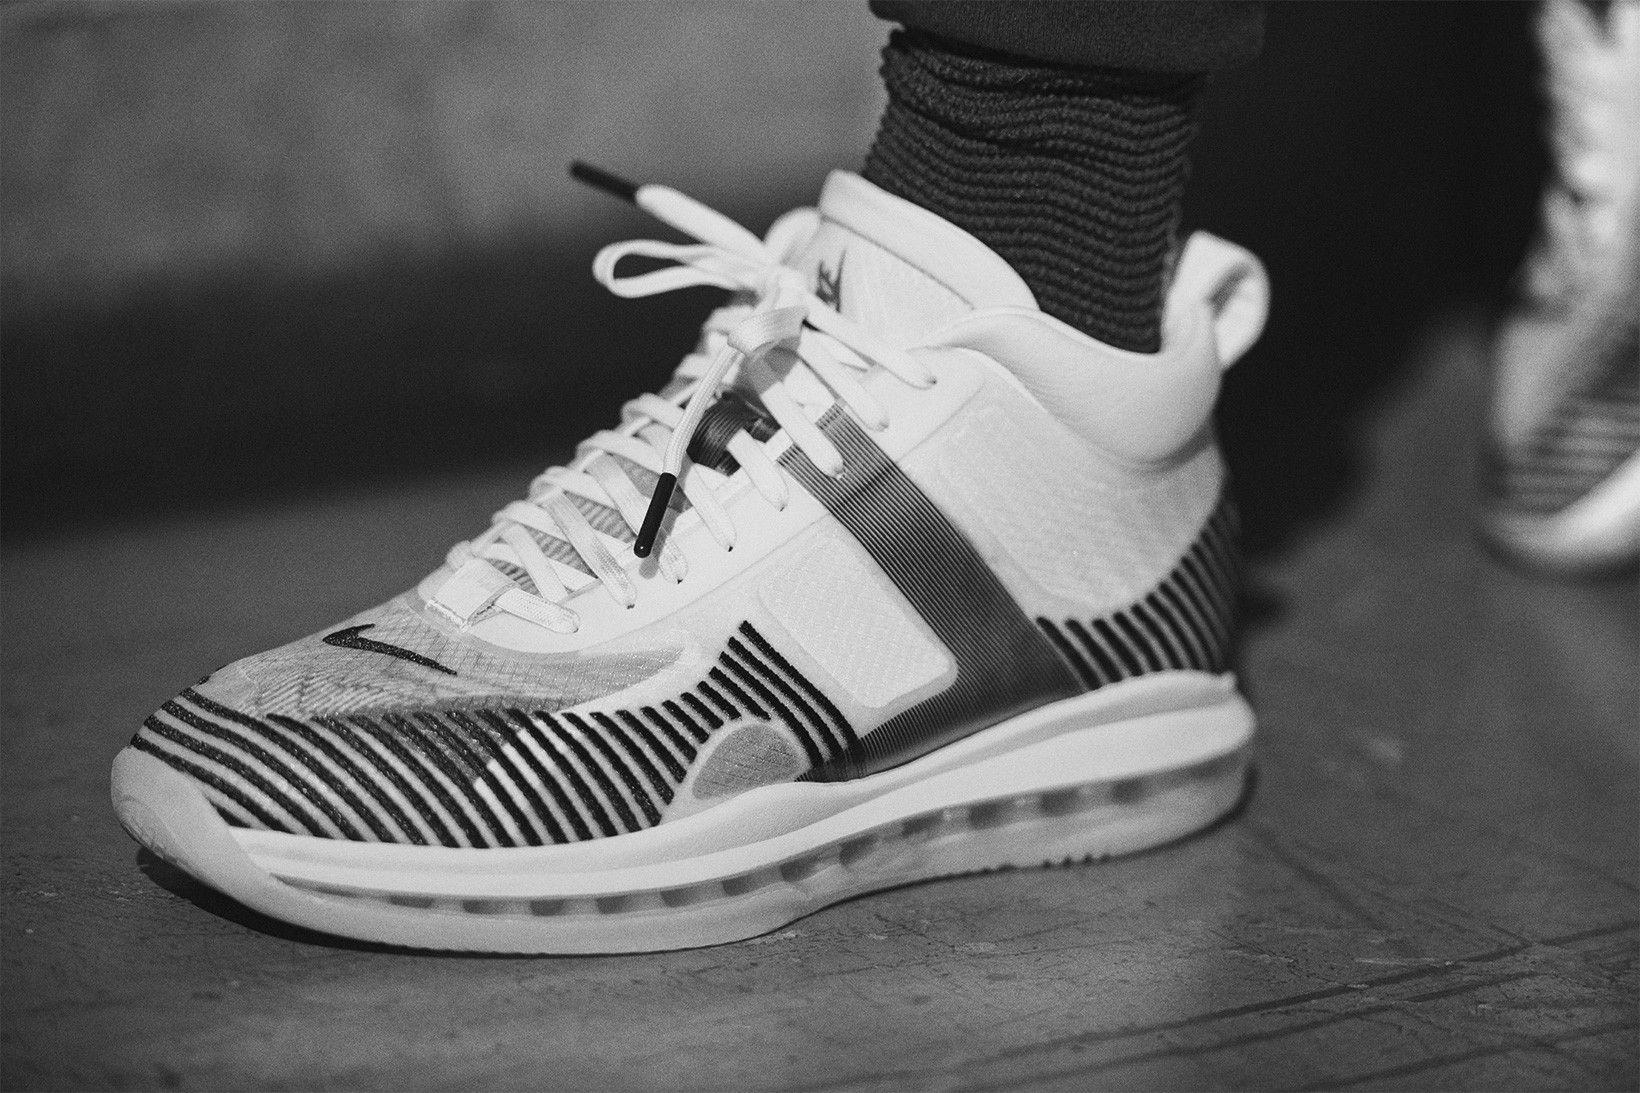 best authentic 5d875 cc25a nike lebron james john elliott icon collection fashion footwear 2018 august  nike basketball